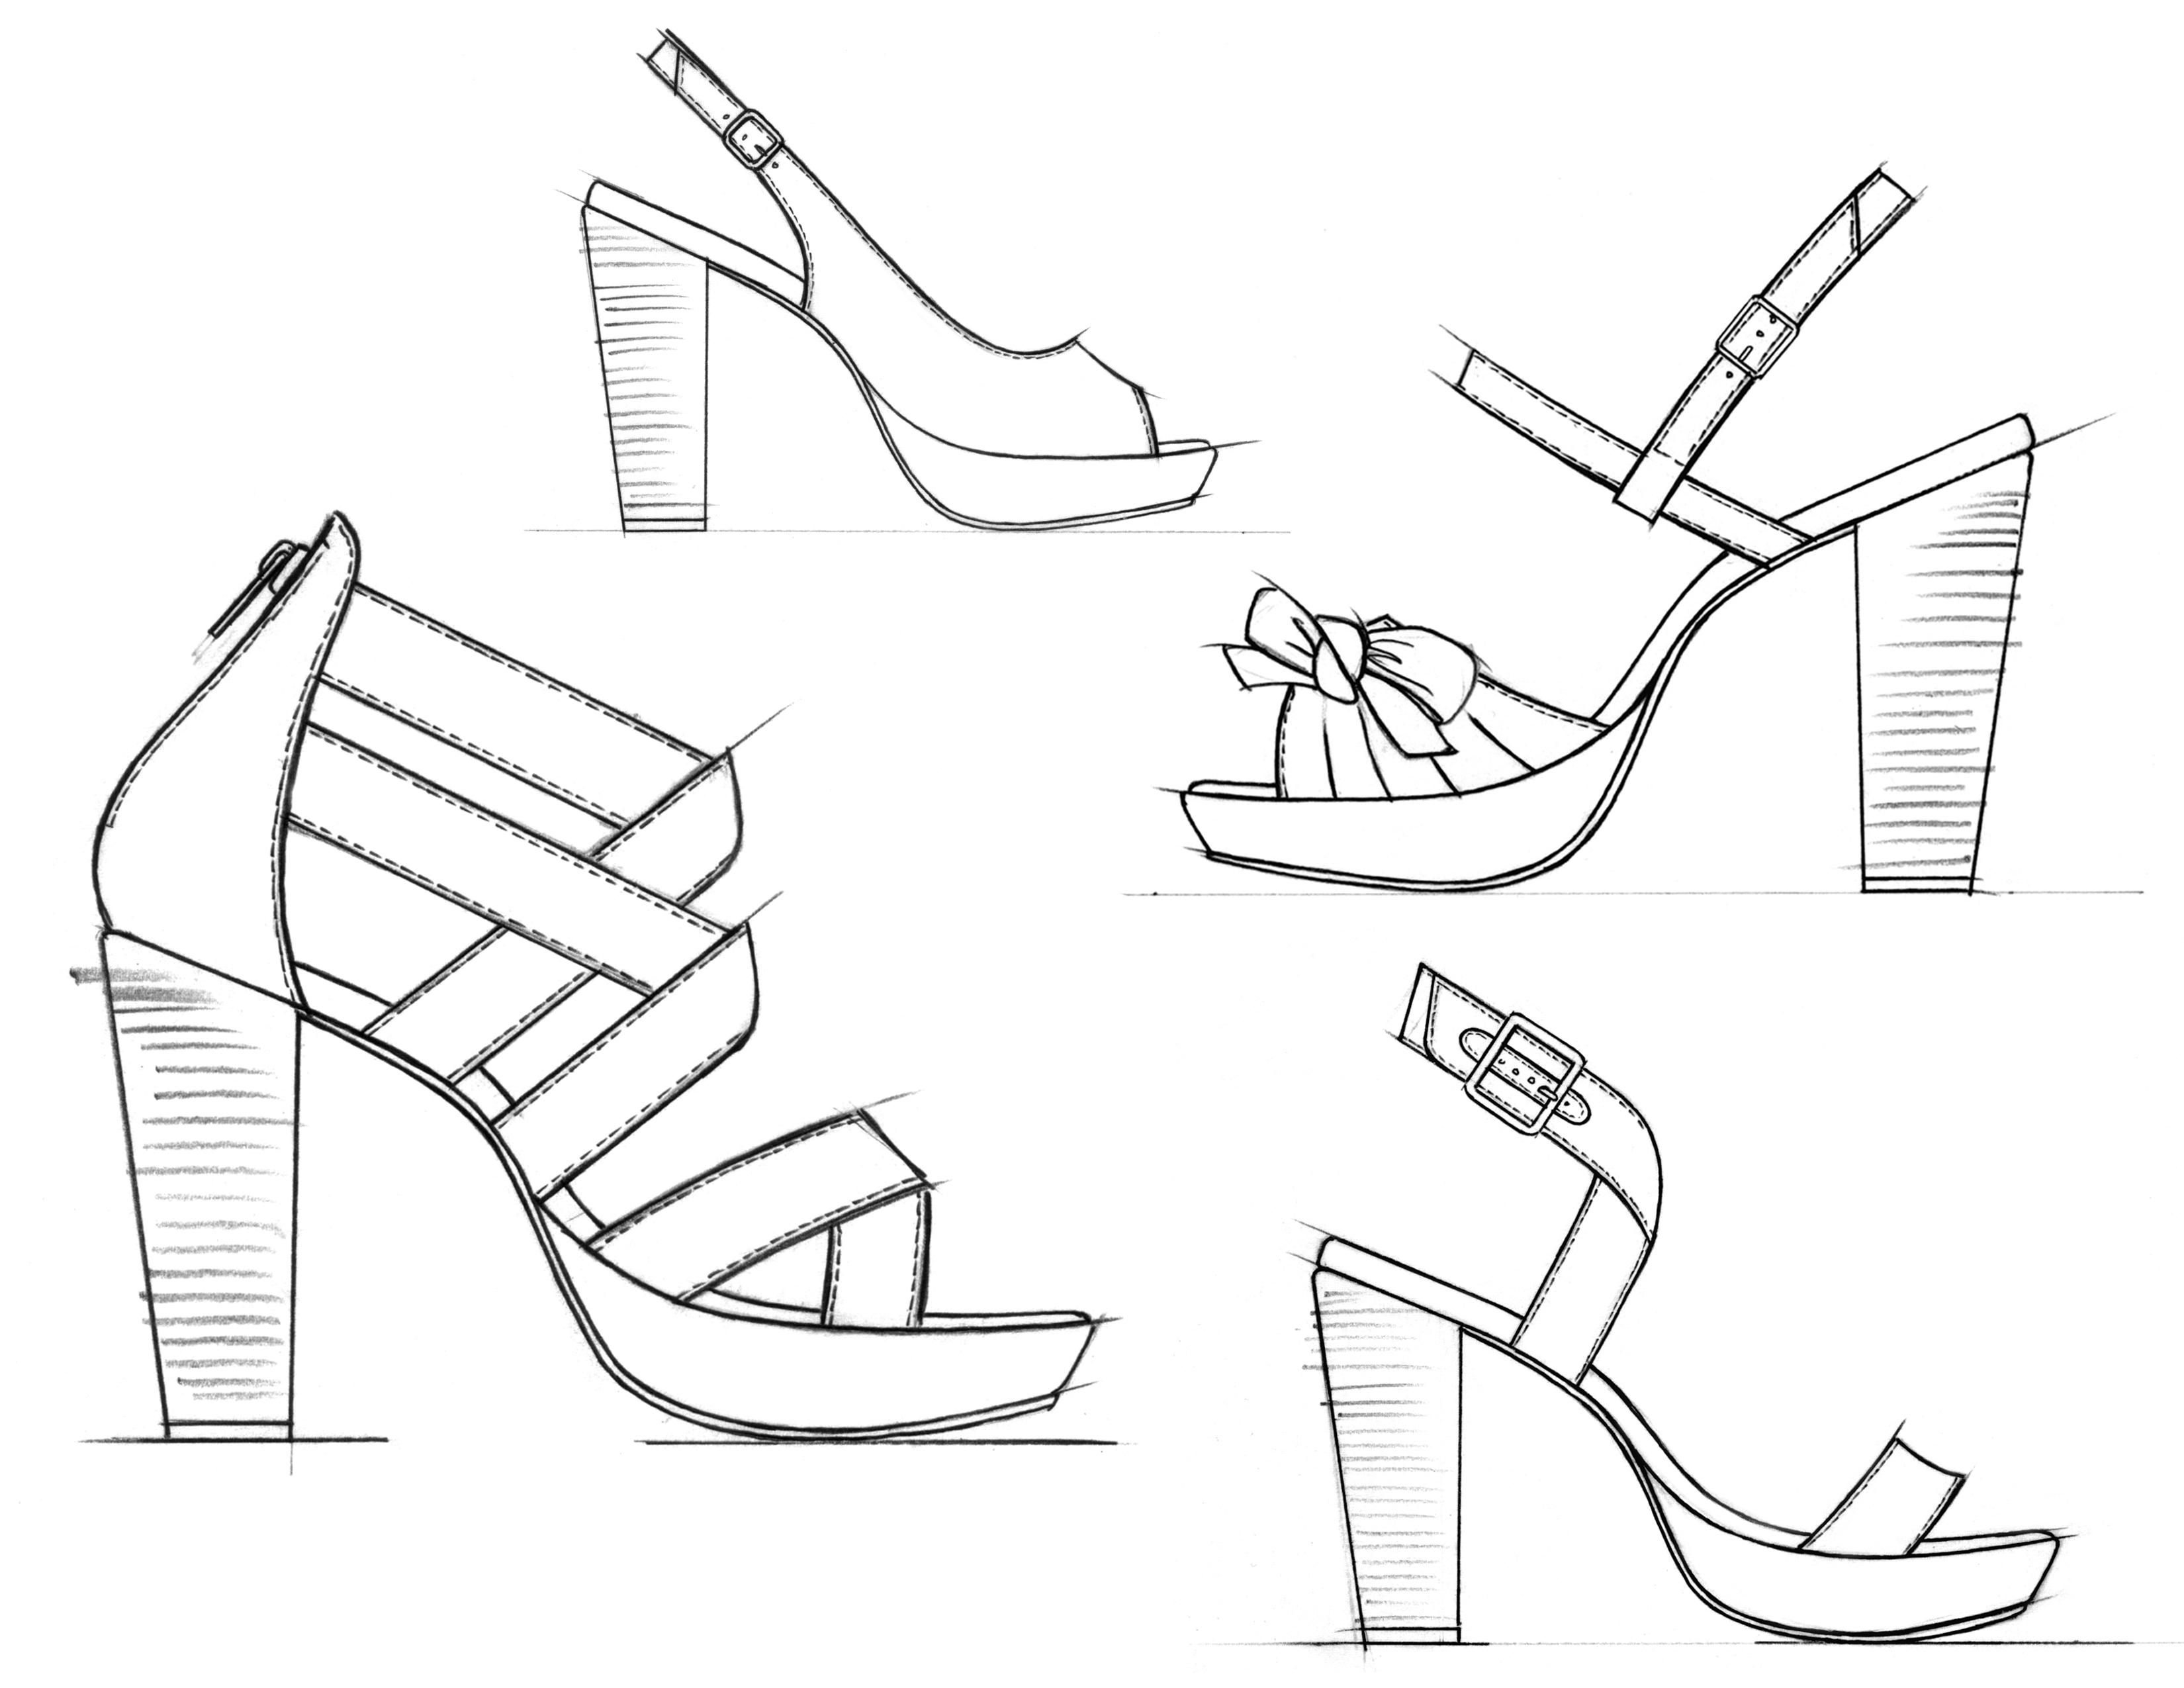 Footwear Sketches By Jason Clifton At Coroflot